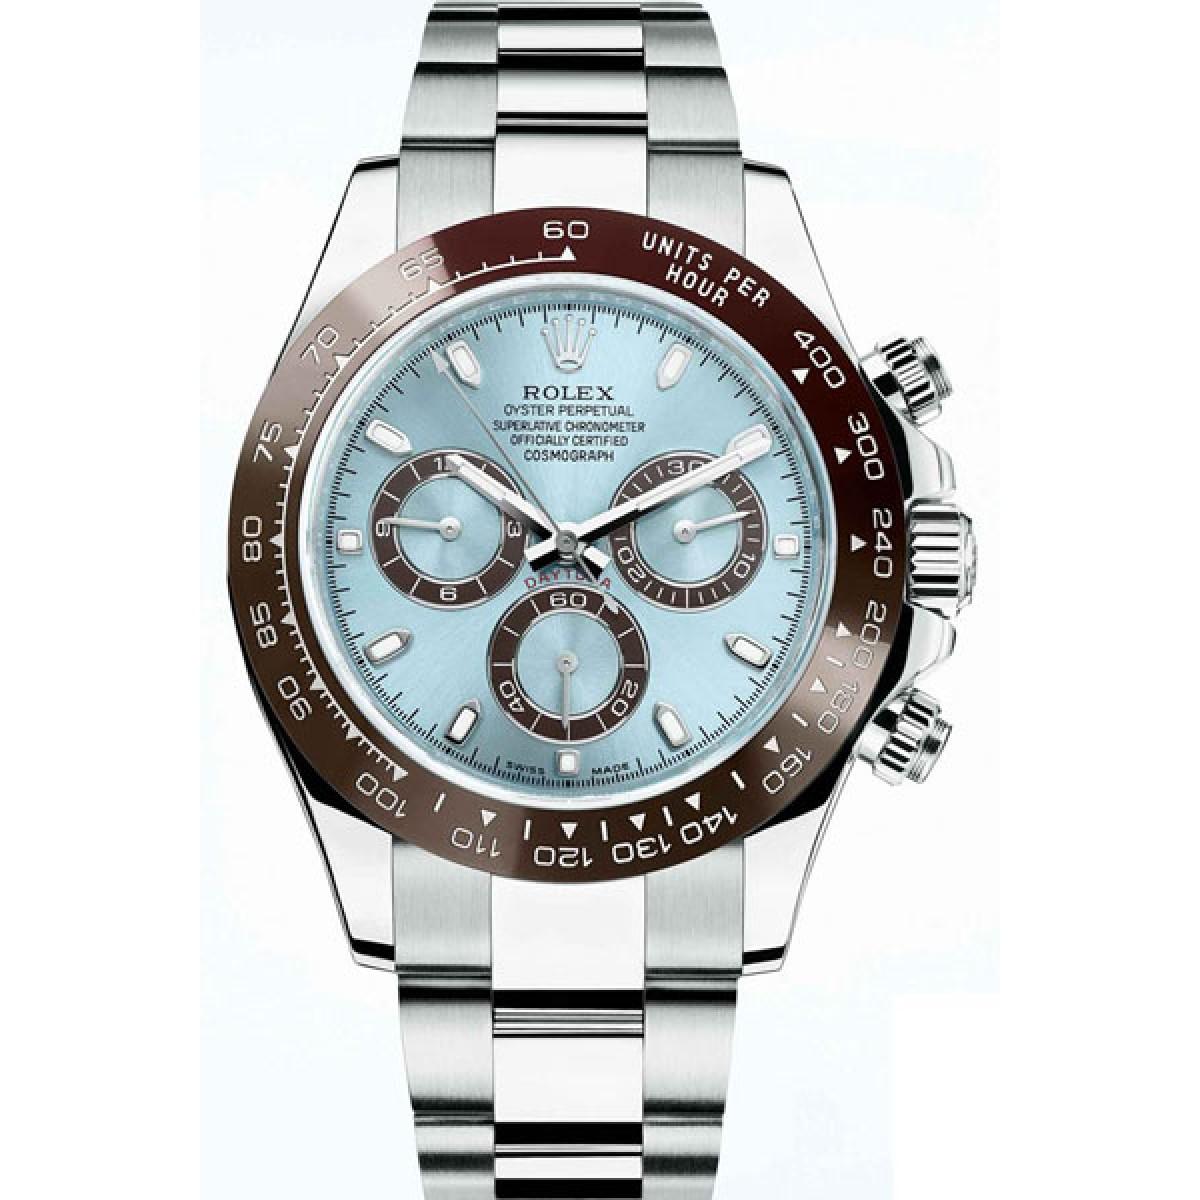 3f0db65ab54 Relógio Réplica Rolex Daytona Platinum